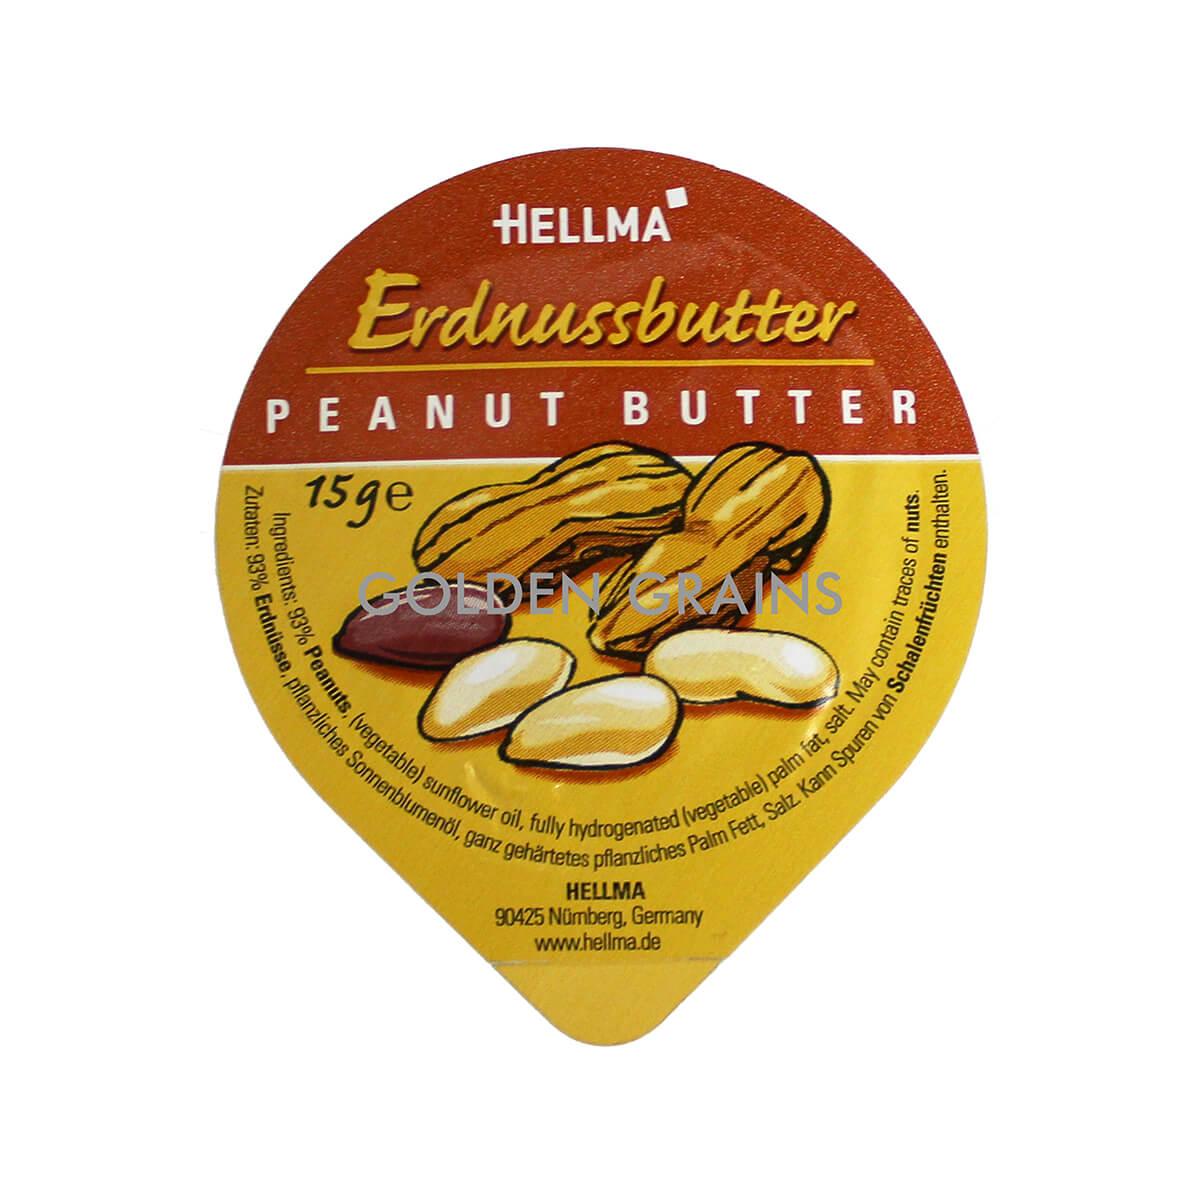 Golden Grains Dubai Export - Hellma - Peanut Butter.jpg